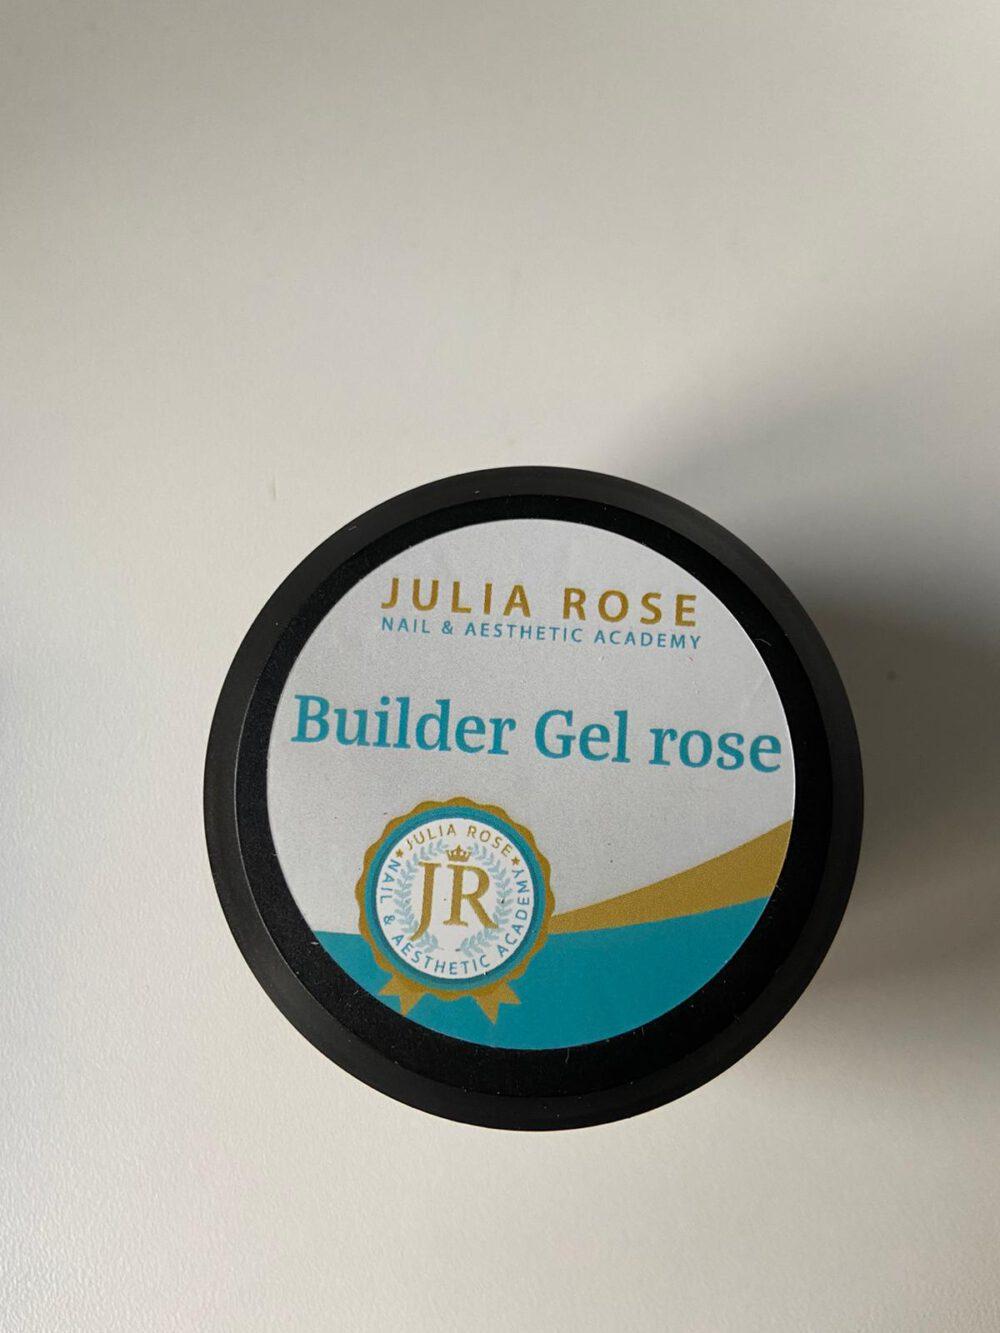 Builder Gel rose